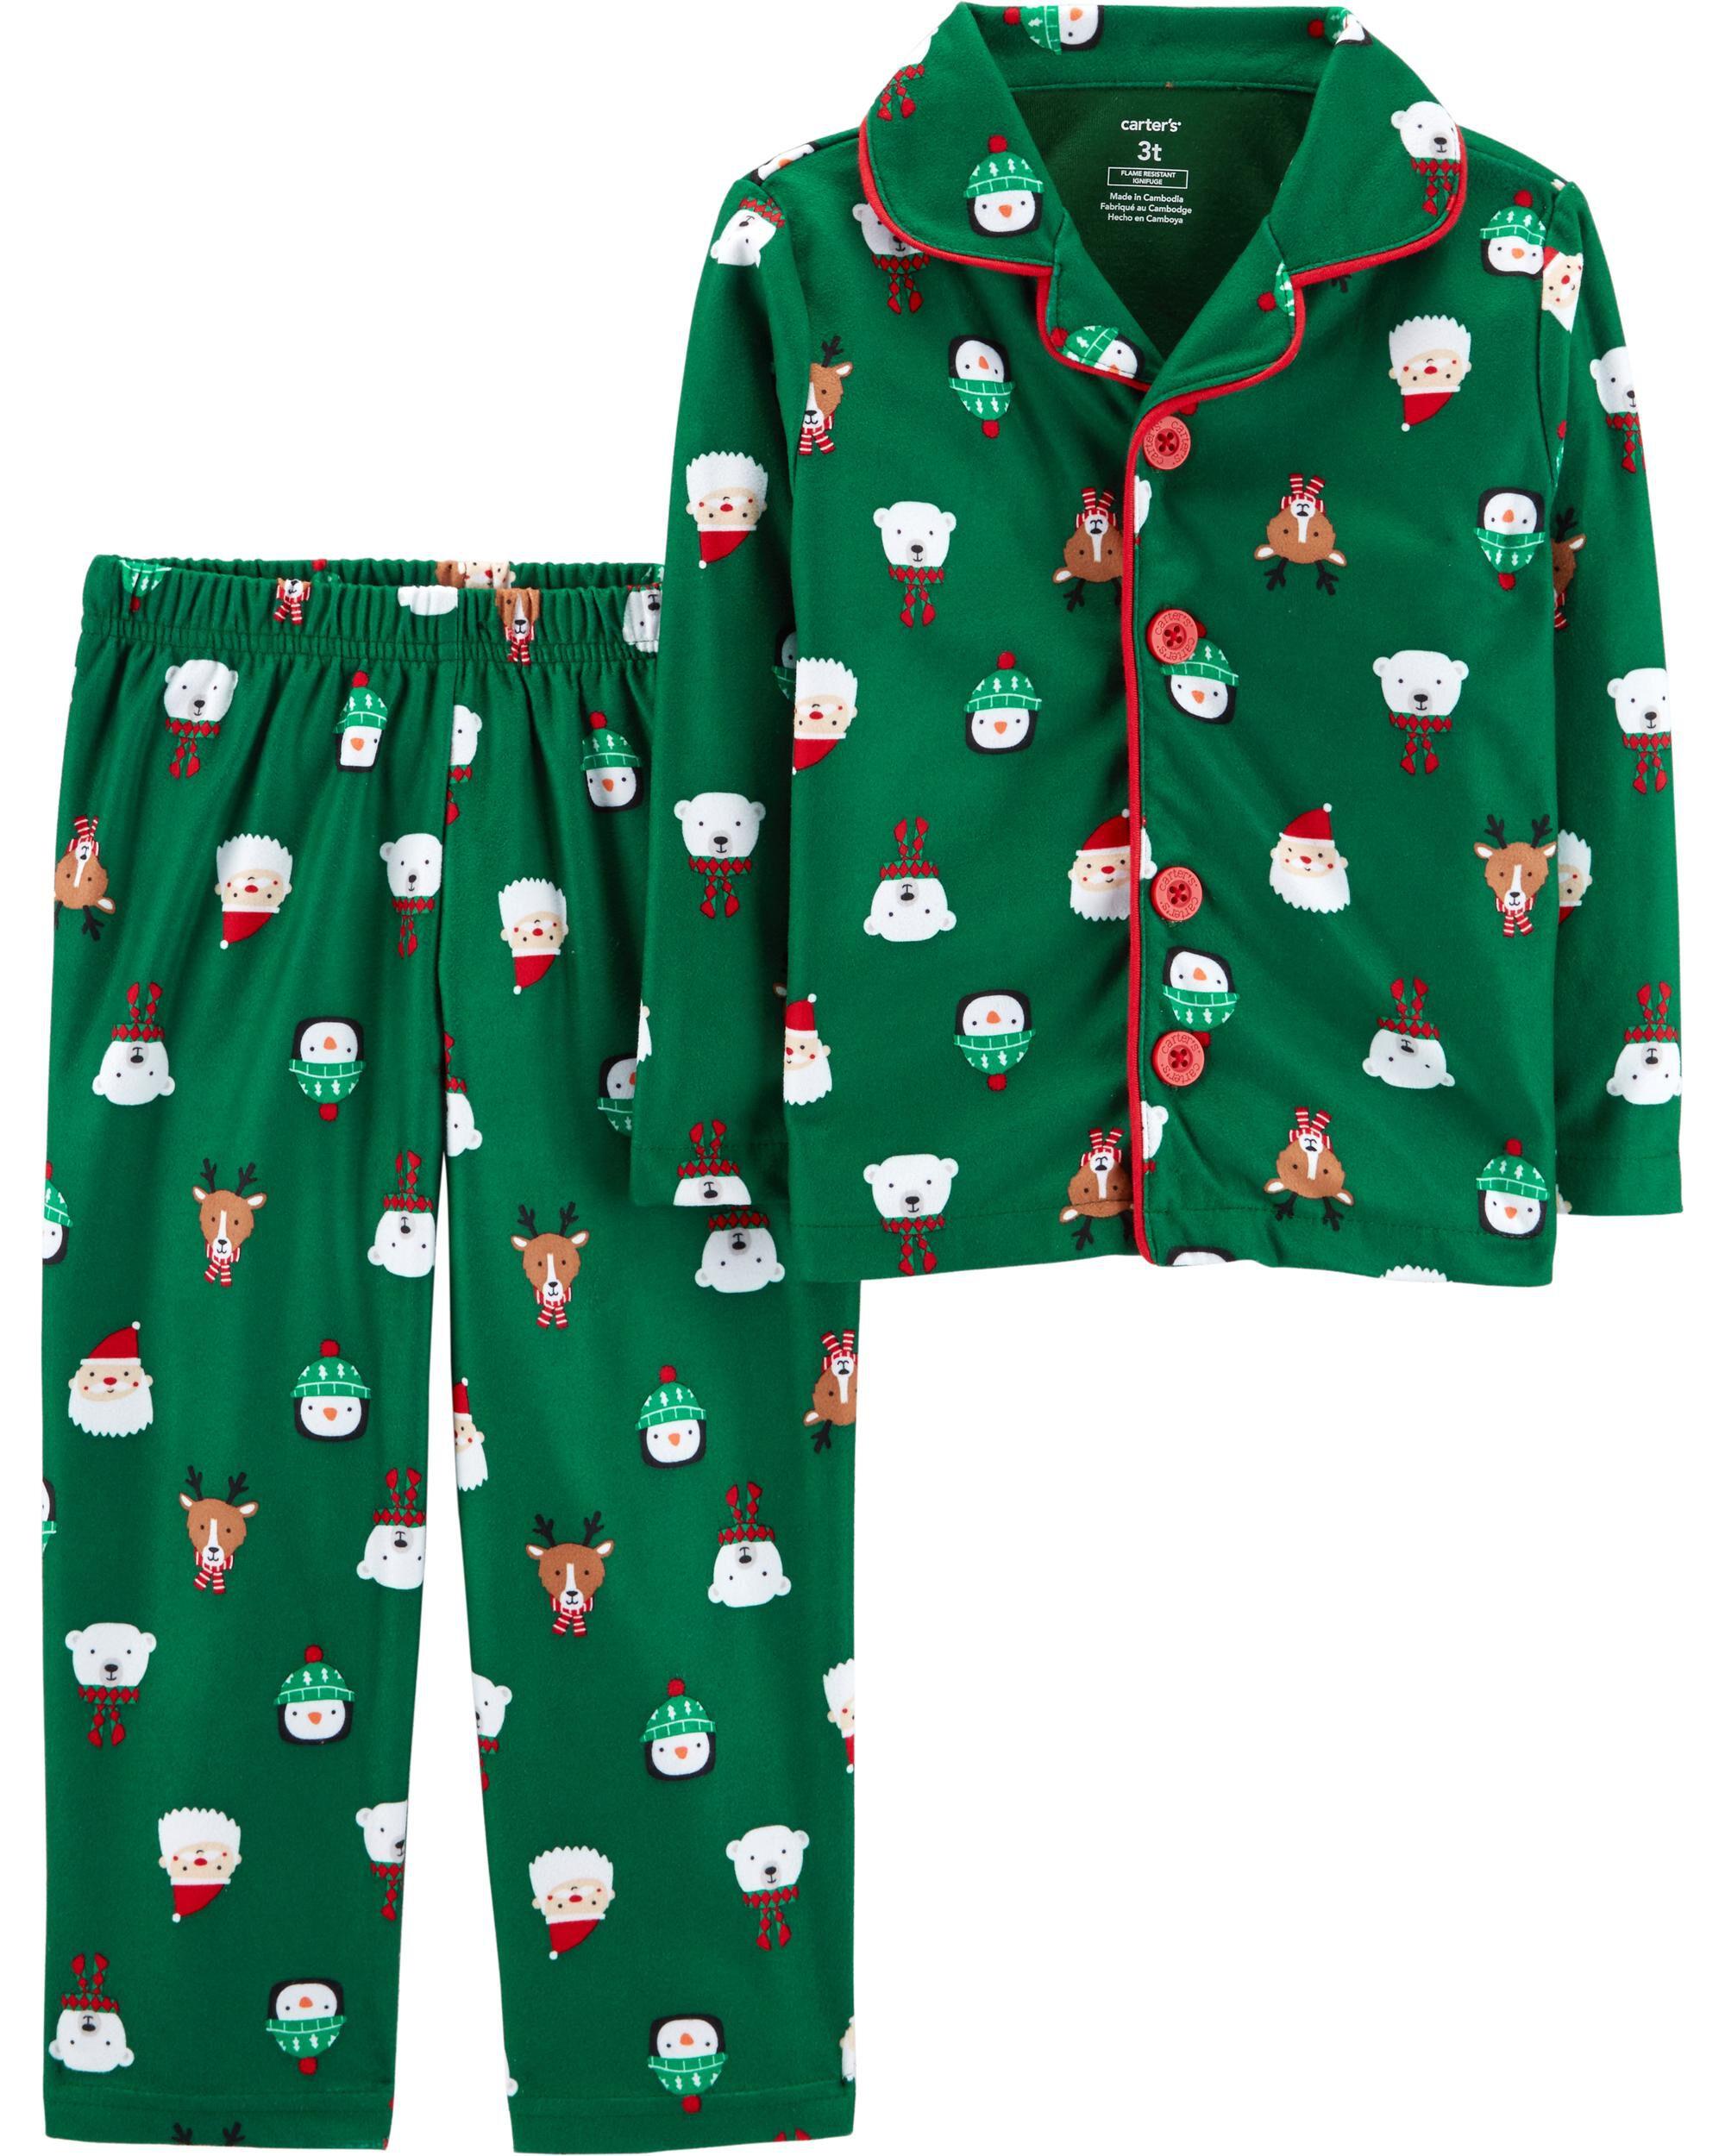 2 piece kid christmas lightweight fleece pjs loading zoom - Christmas Fleece